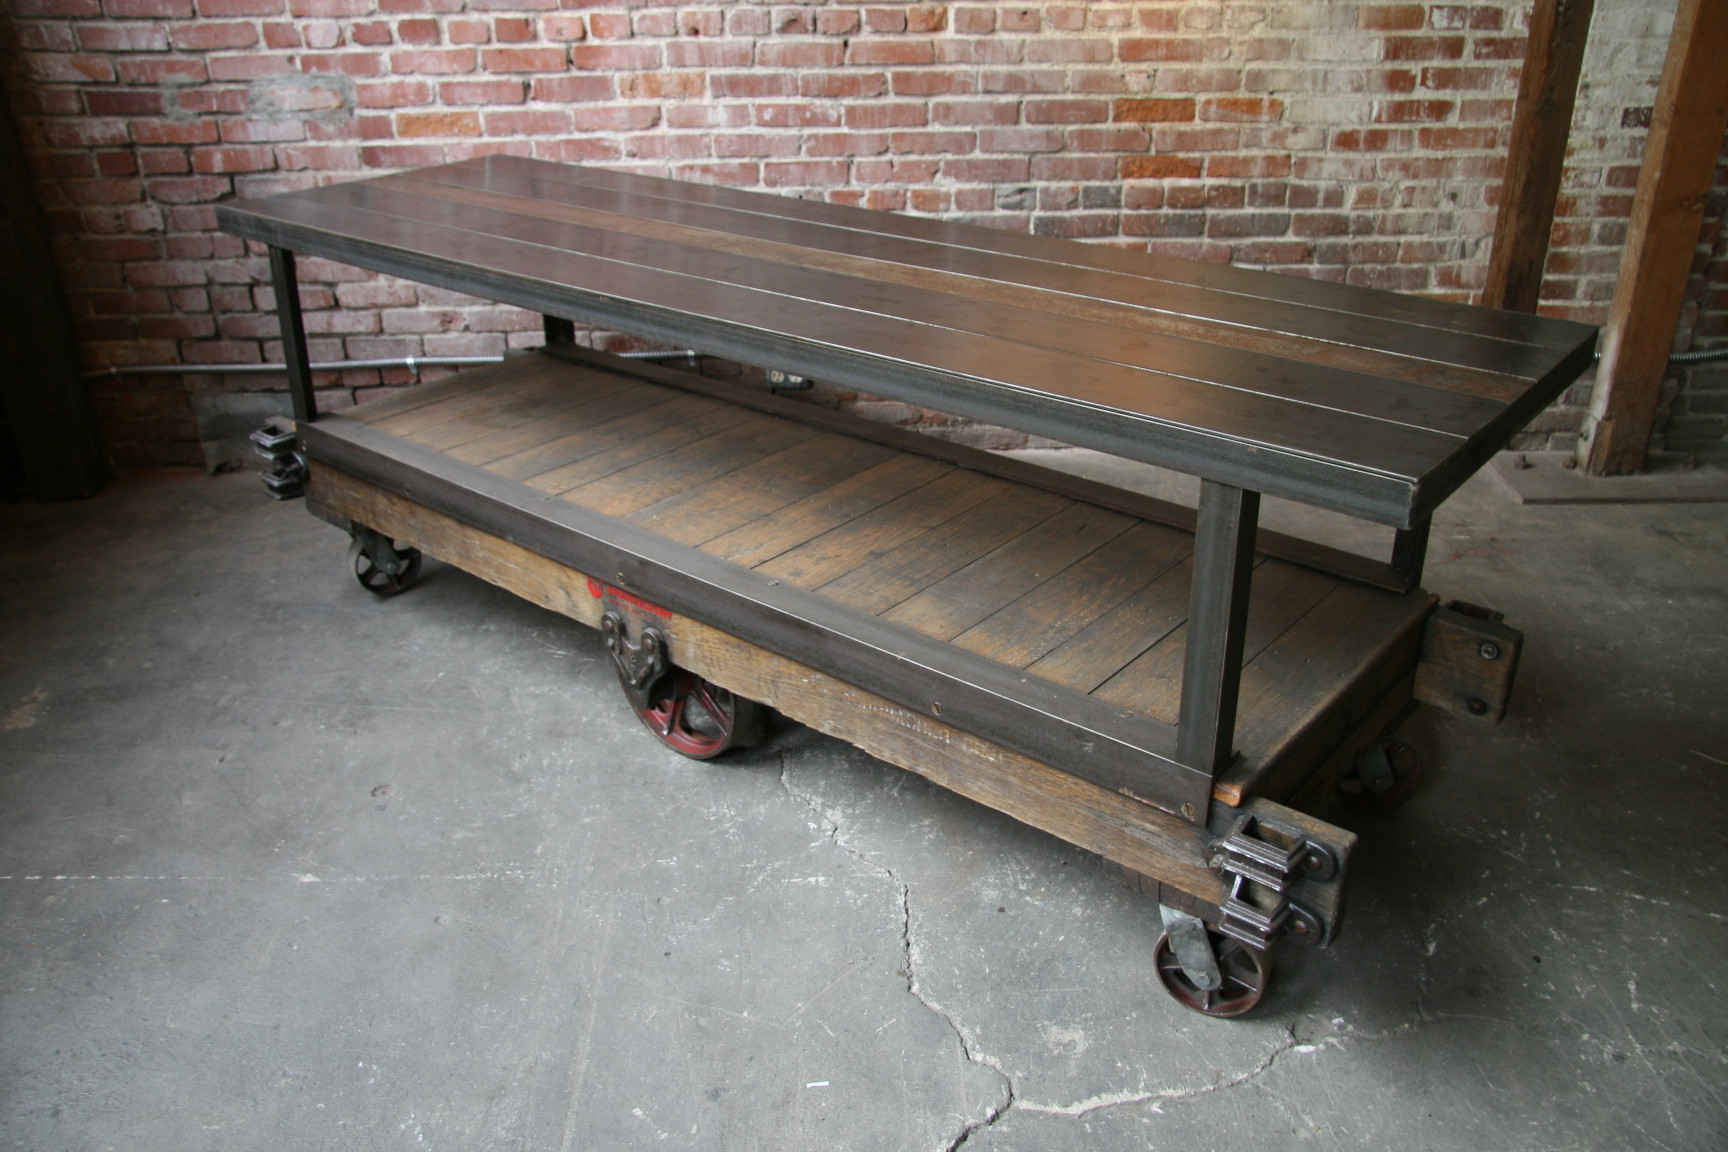 Stupendous Industrial Work Table With Casters Fe56 Advancedmassagebysara Frankydiablos Diy Chair Ideas Frankydiabloscom